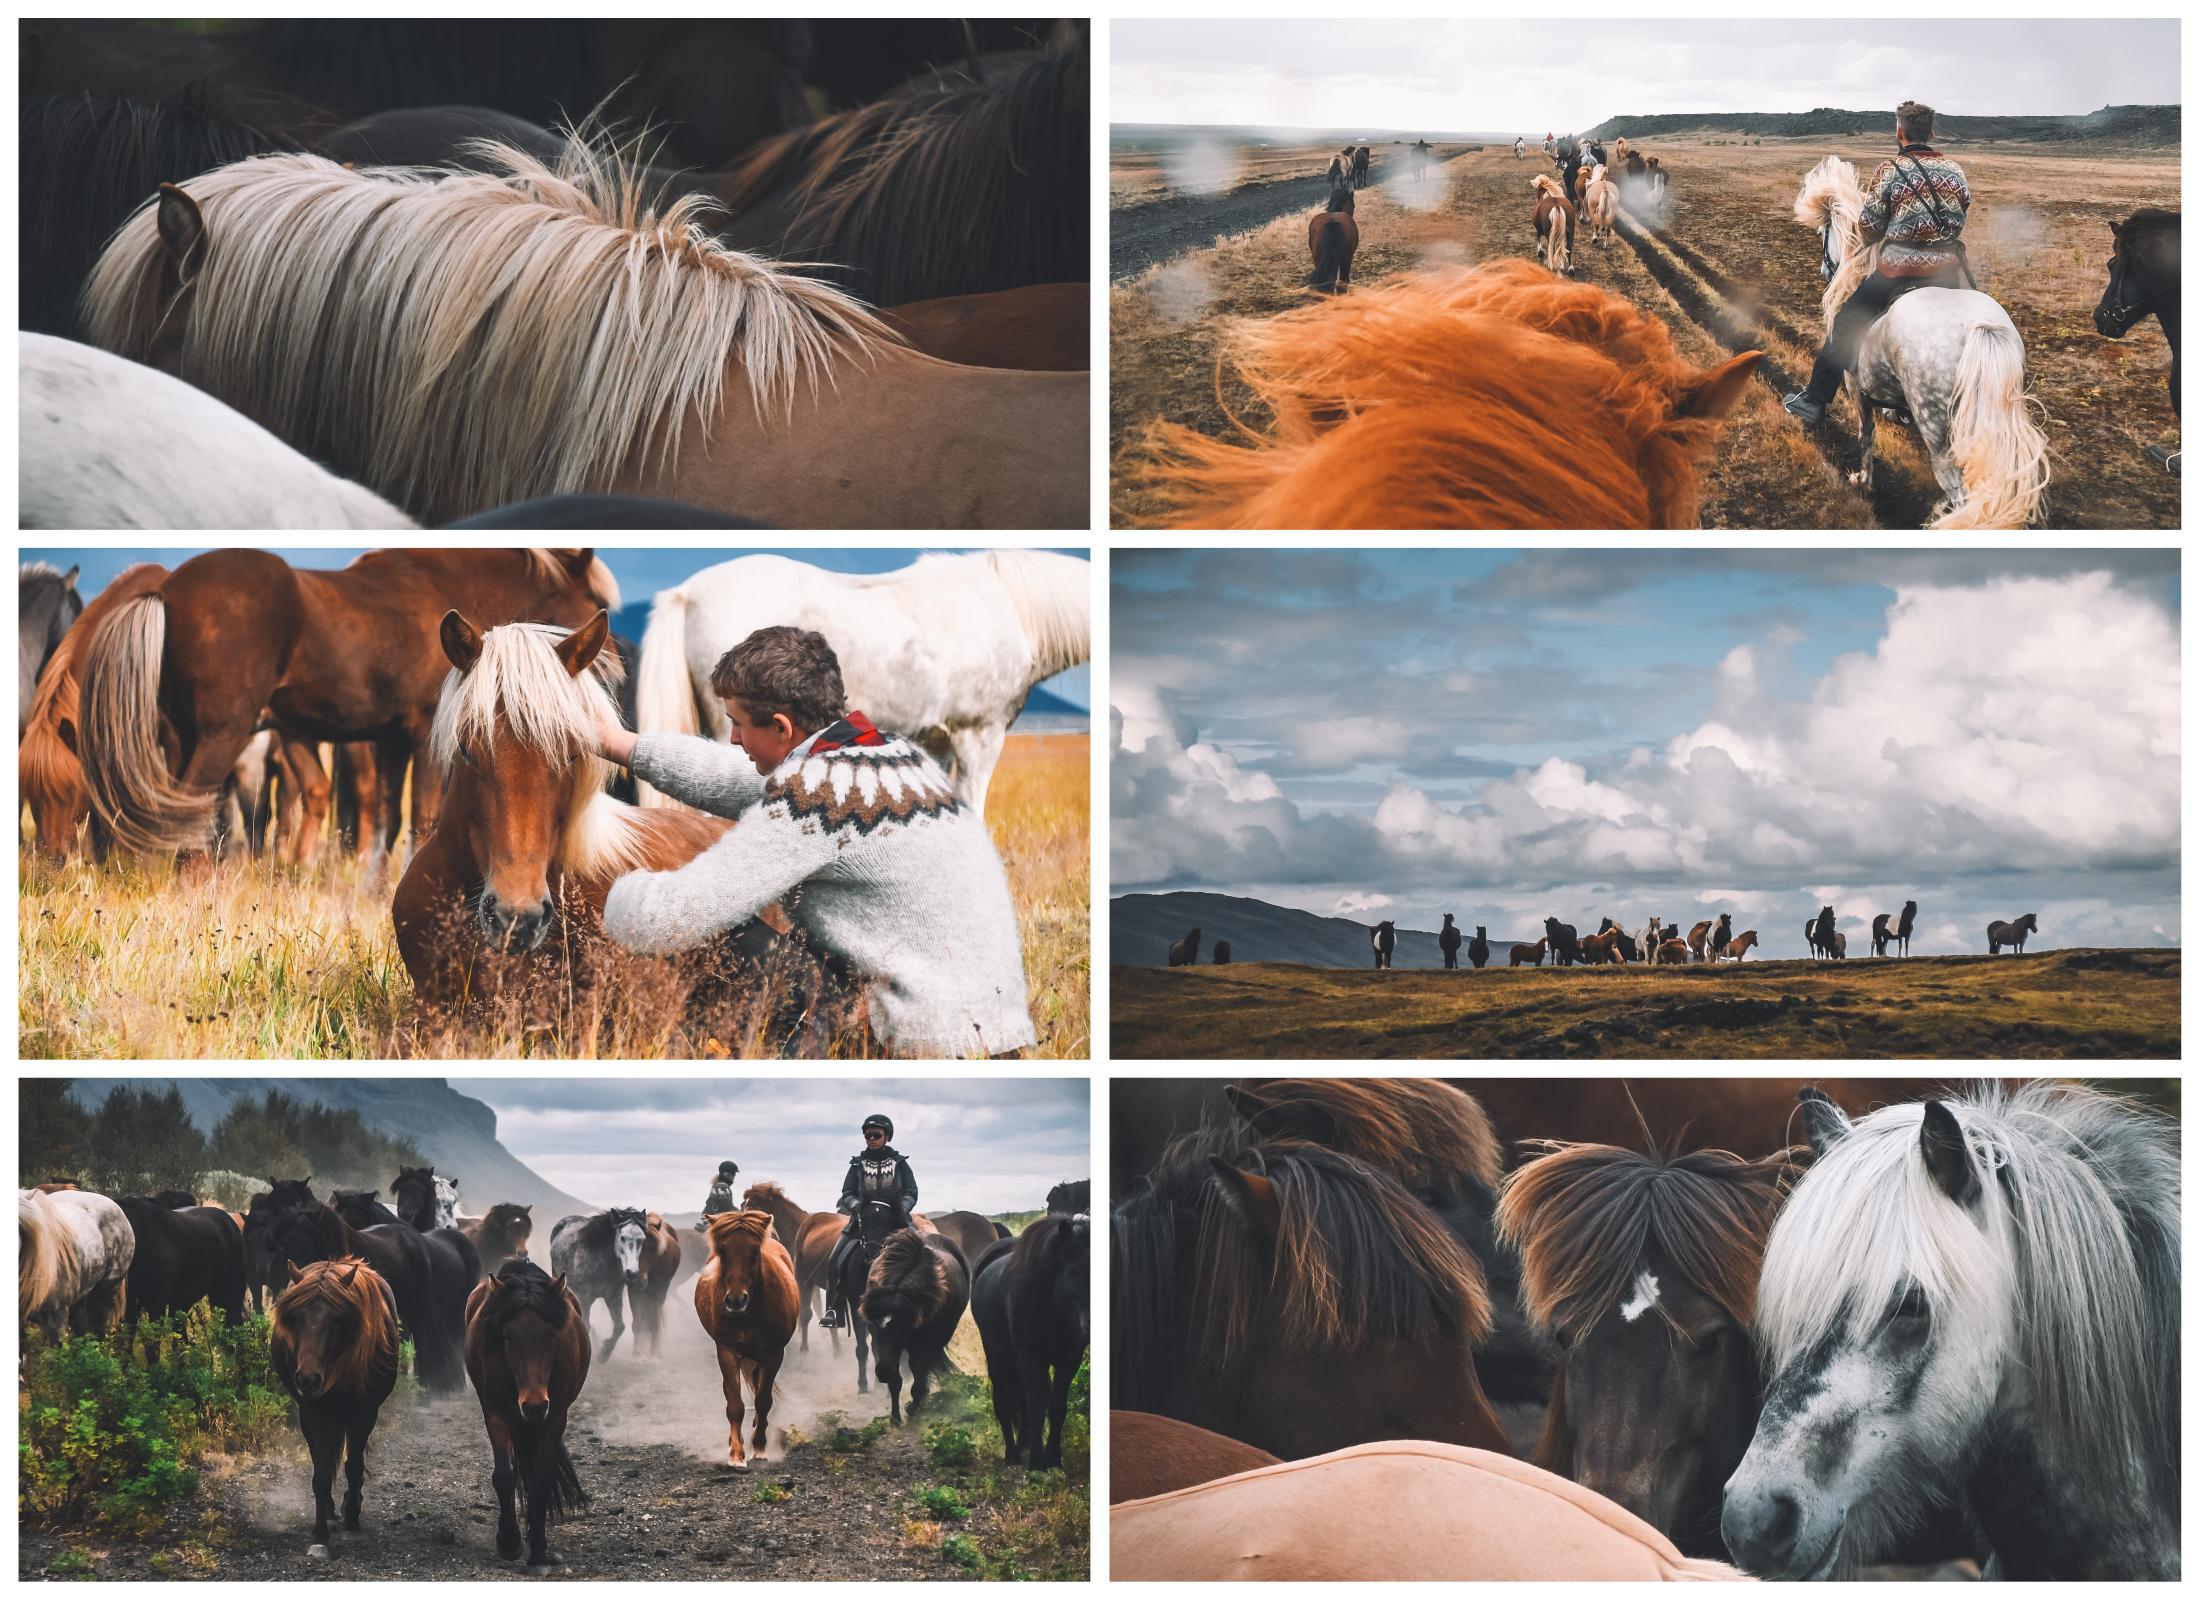 islande à cheval